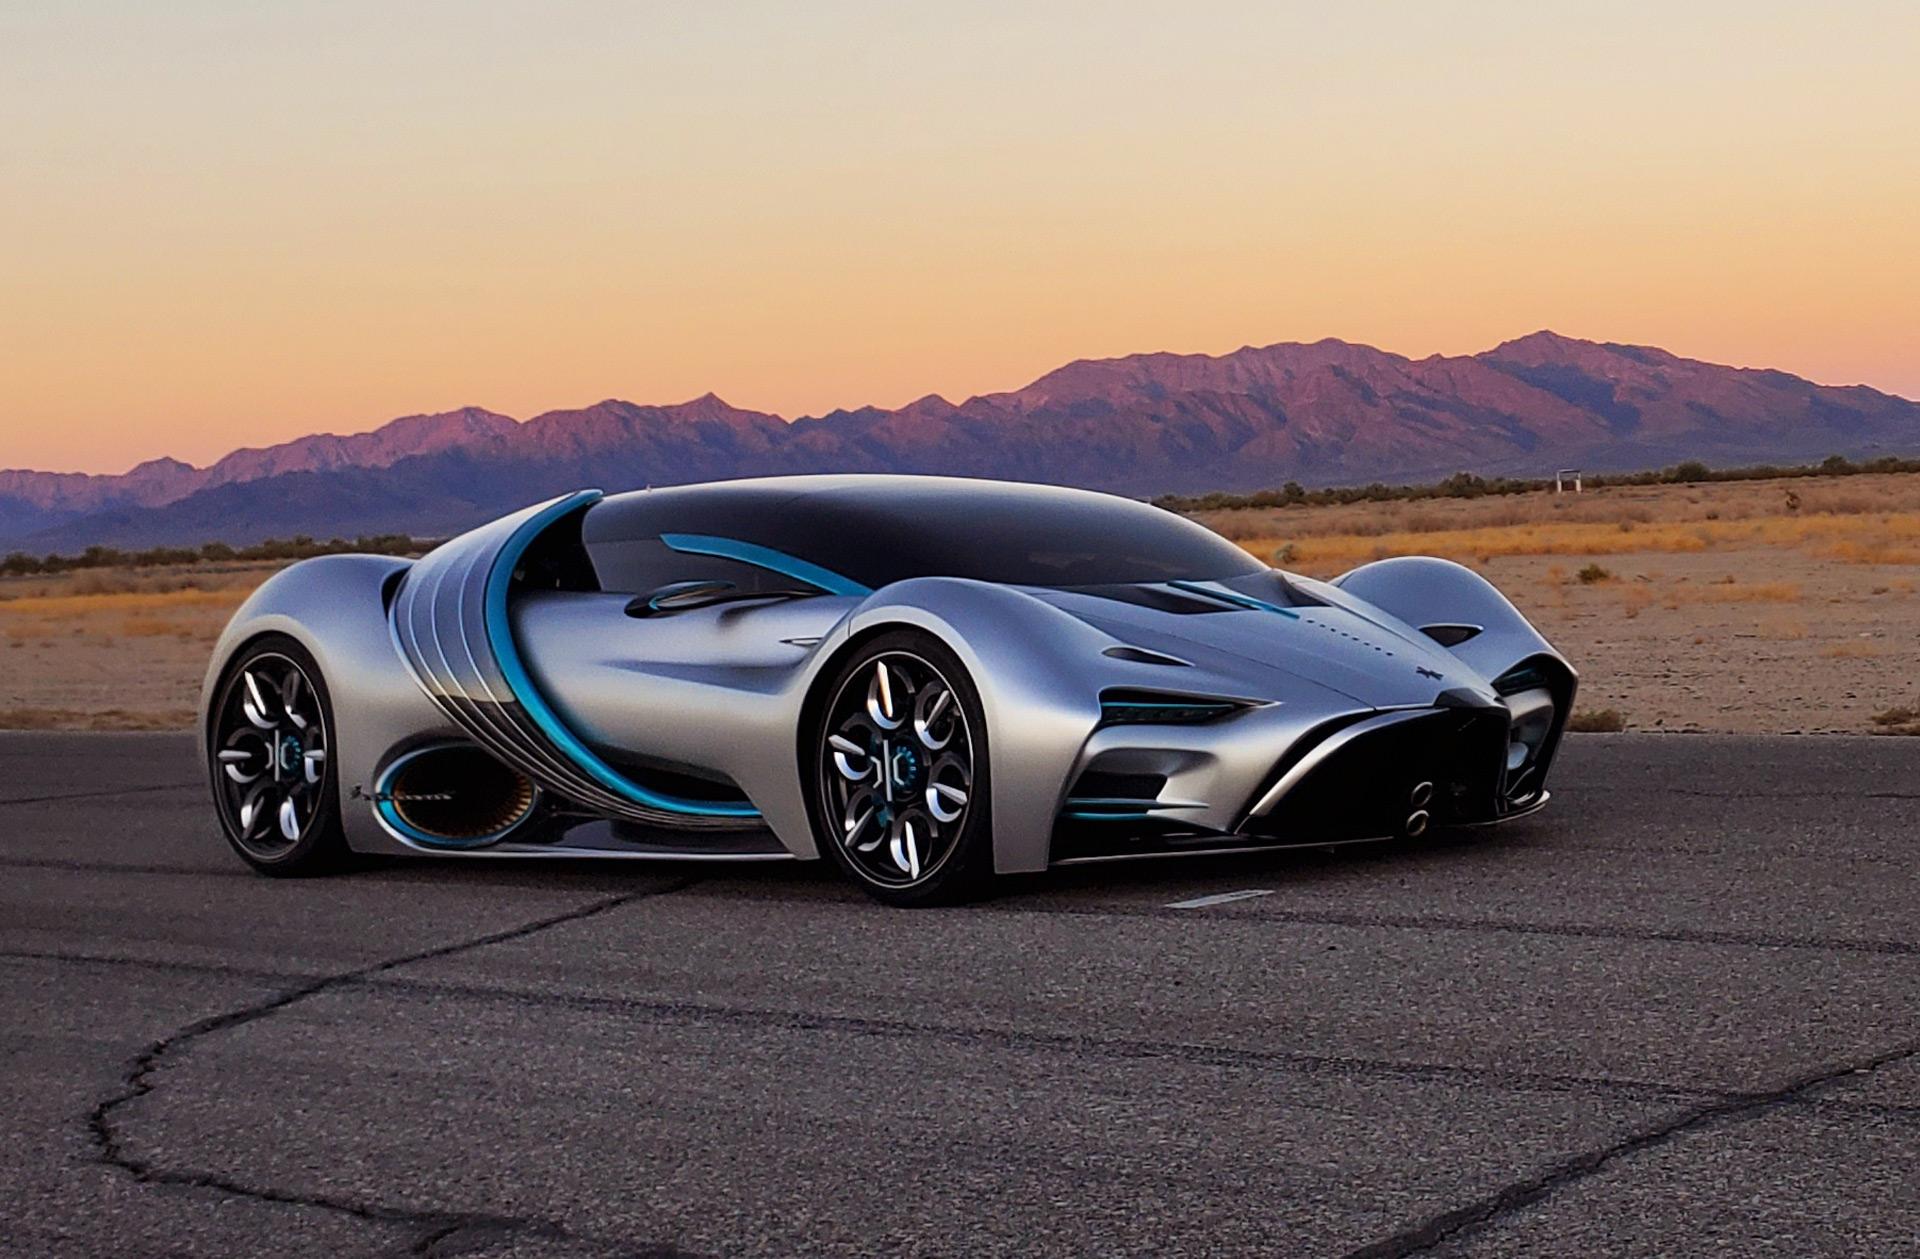 Hyperion XP-1 hydrogen fuel-cell supercar touts 1,000-mile range, 221-mph top speed